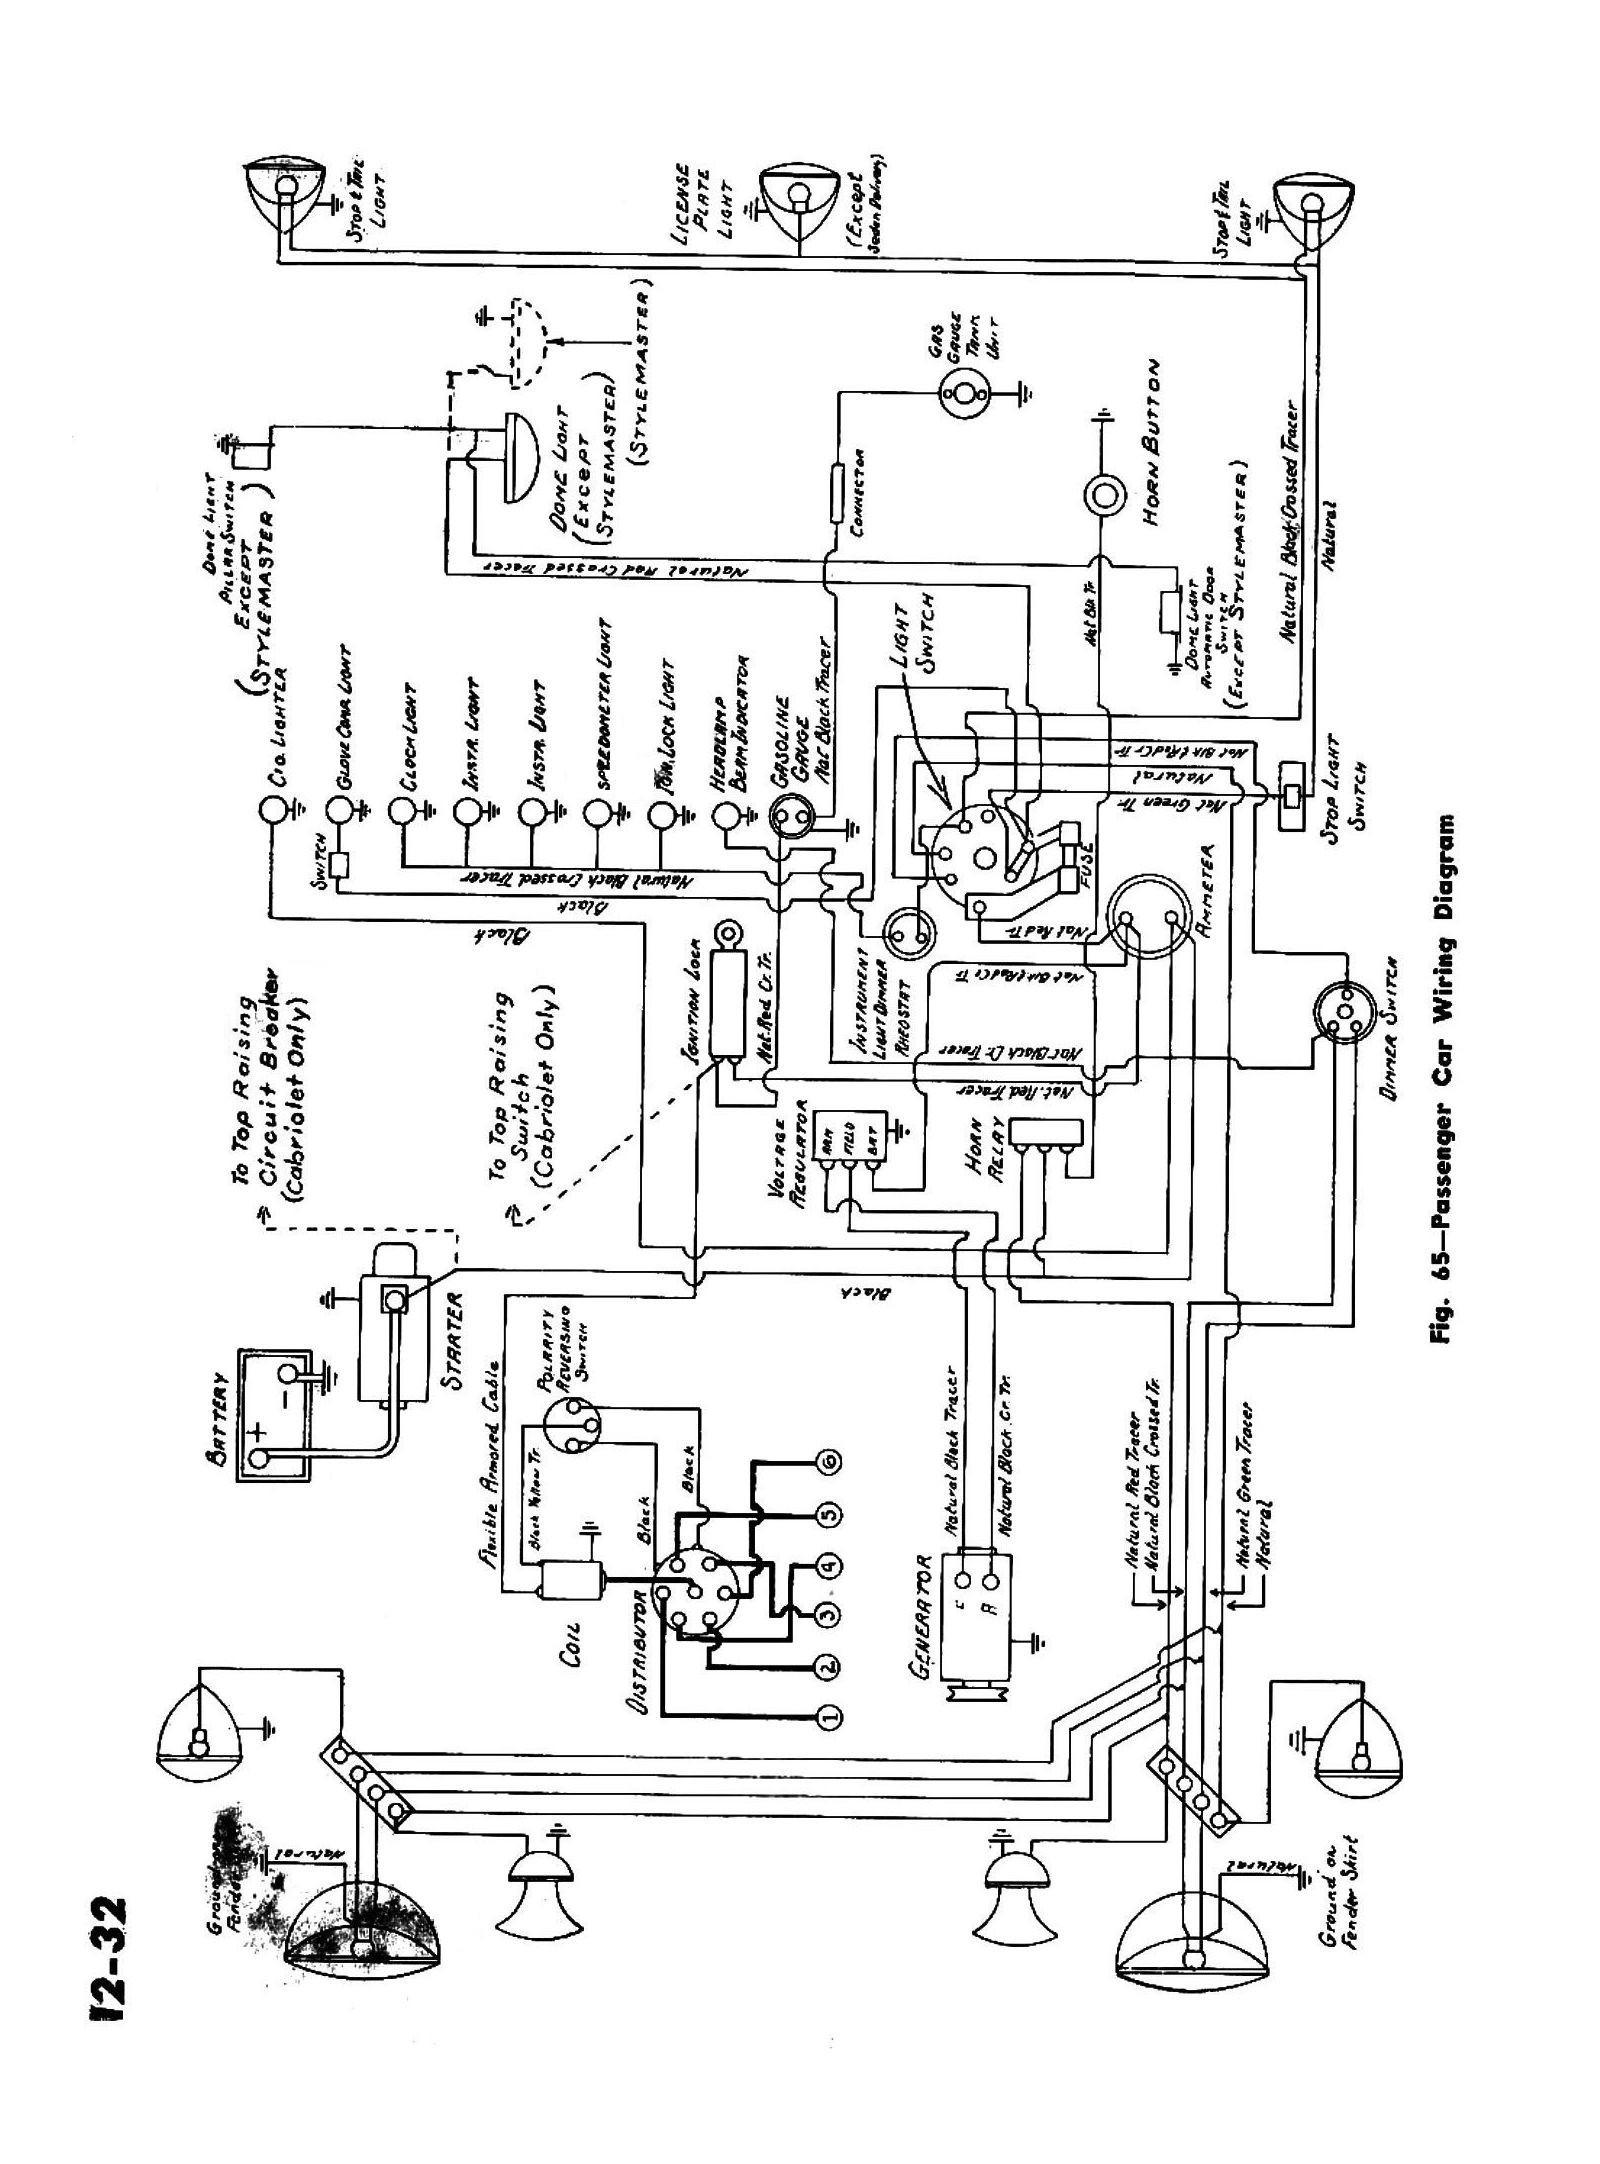 1947 Passenger Car Wiring · 1947 Truck Wiring